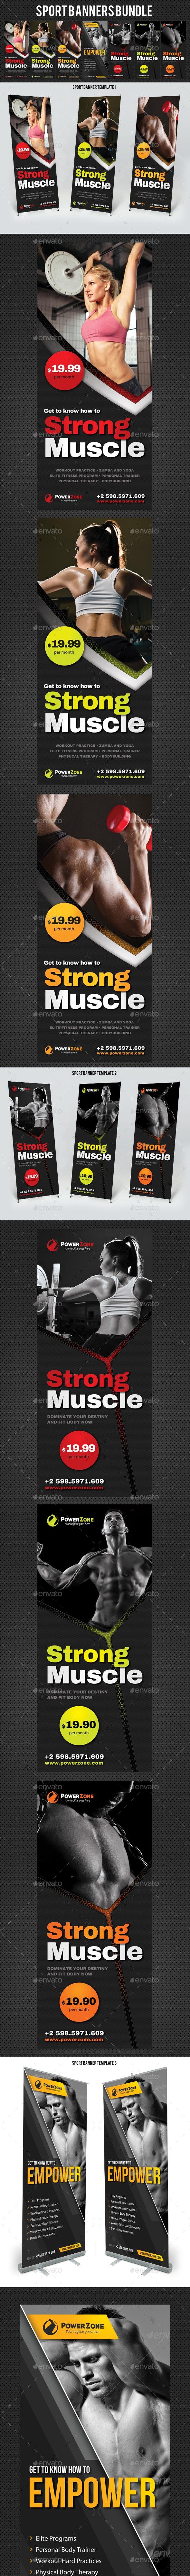 Sport Banners Bundle - Signage Print Templates